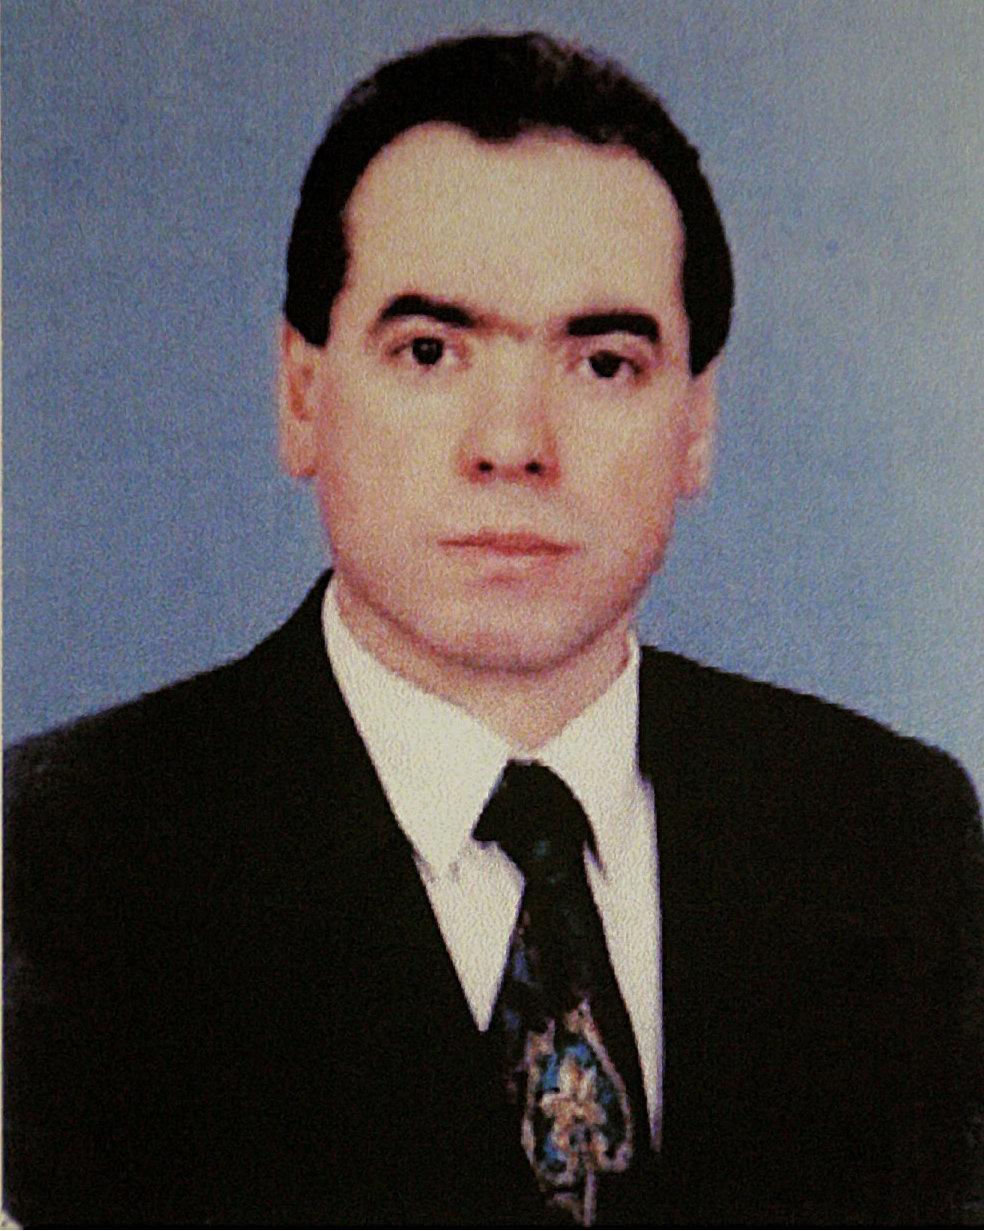 Abdurrahim Özüdogru